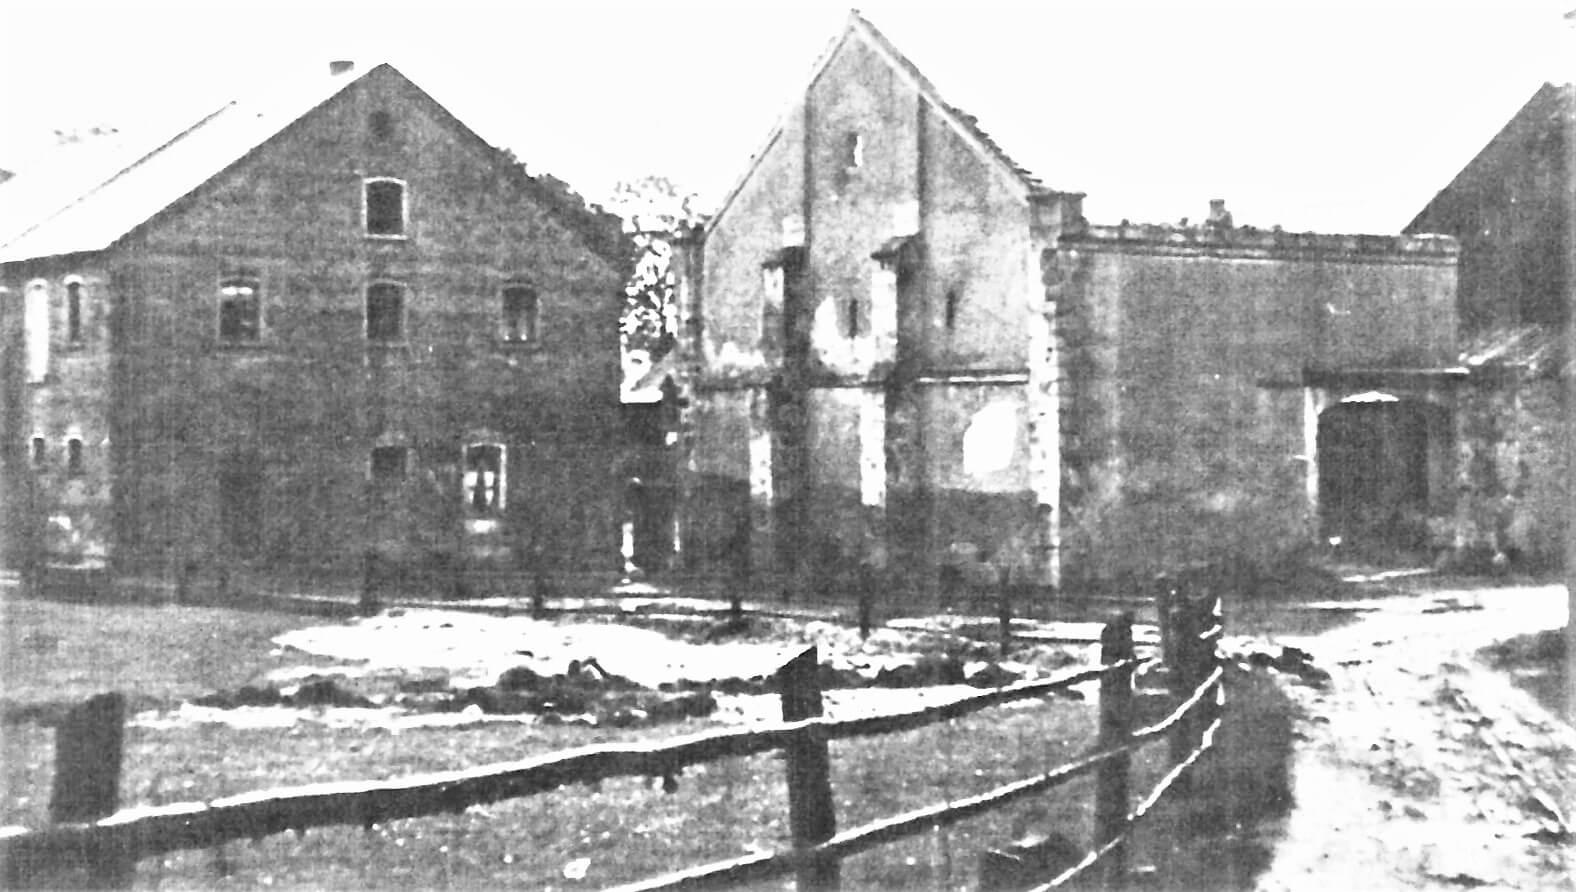 Rittergut Adlershof zu Oberlauterbach - Abriss der Scheune nach Brand © unbekannt